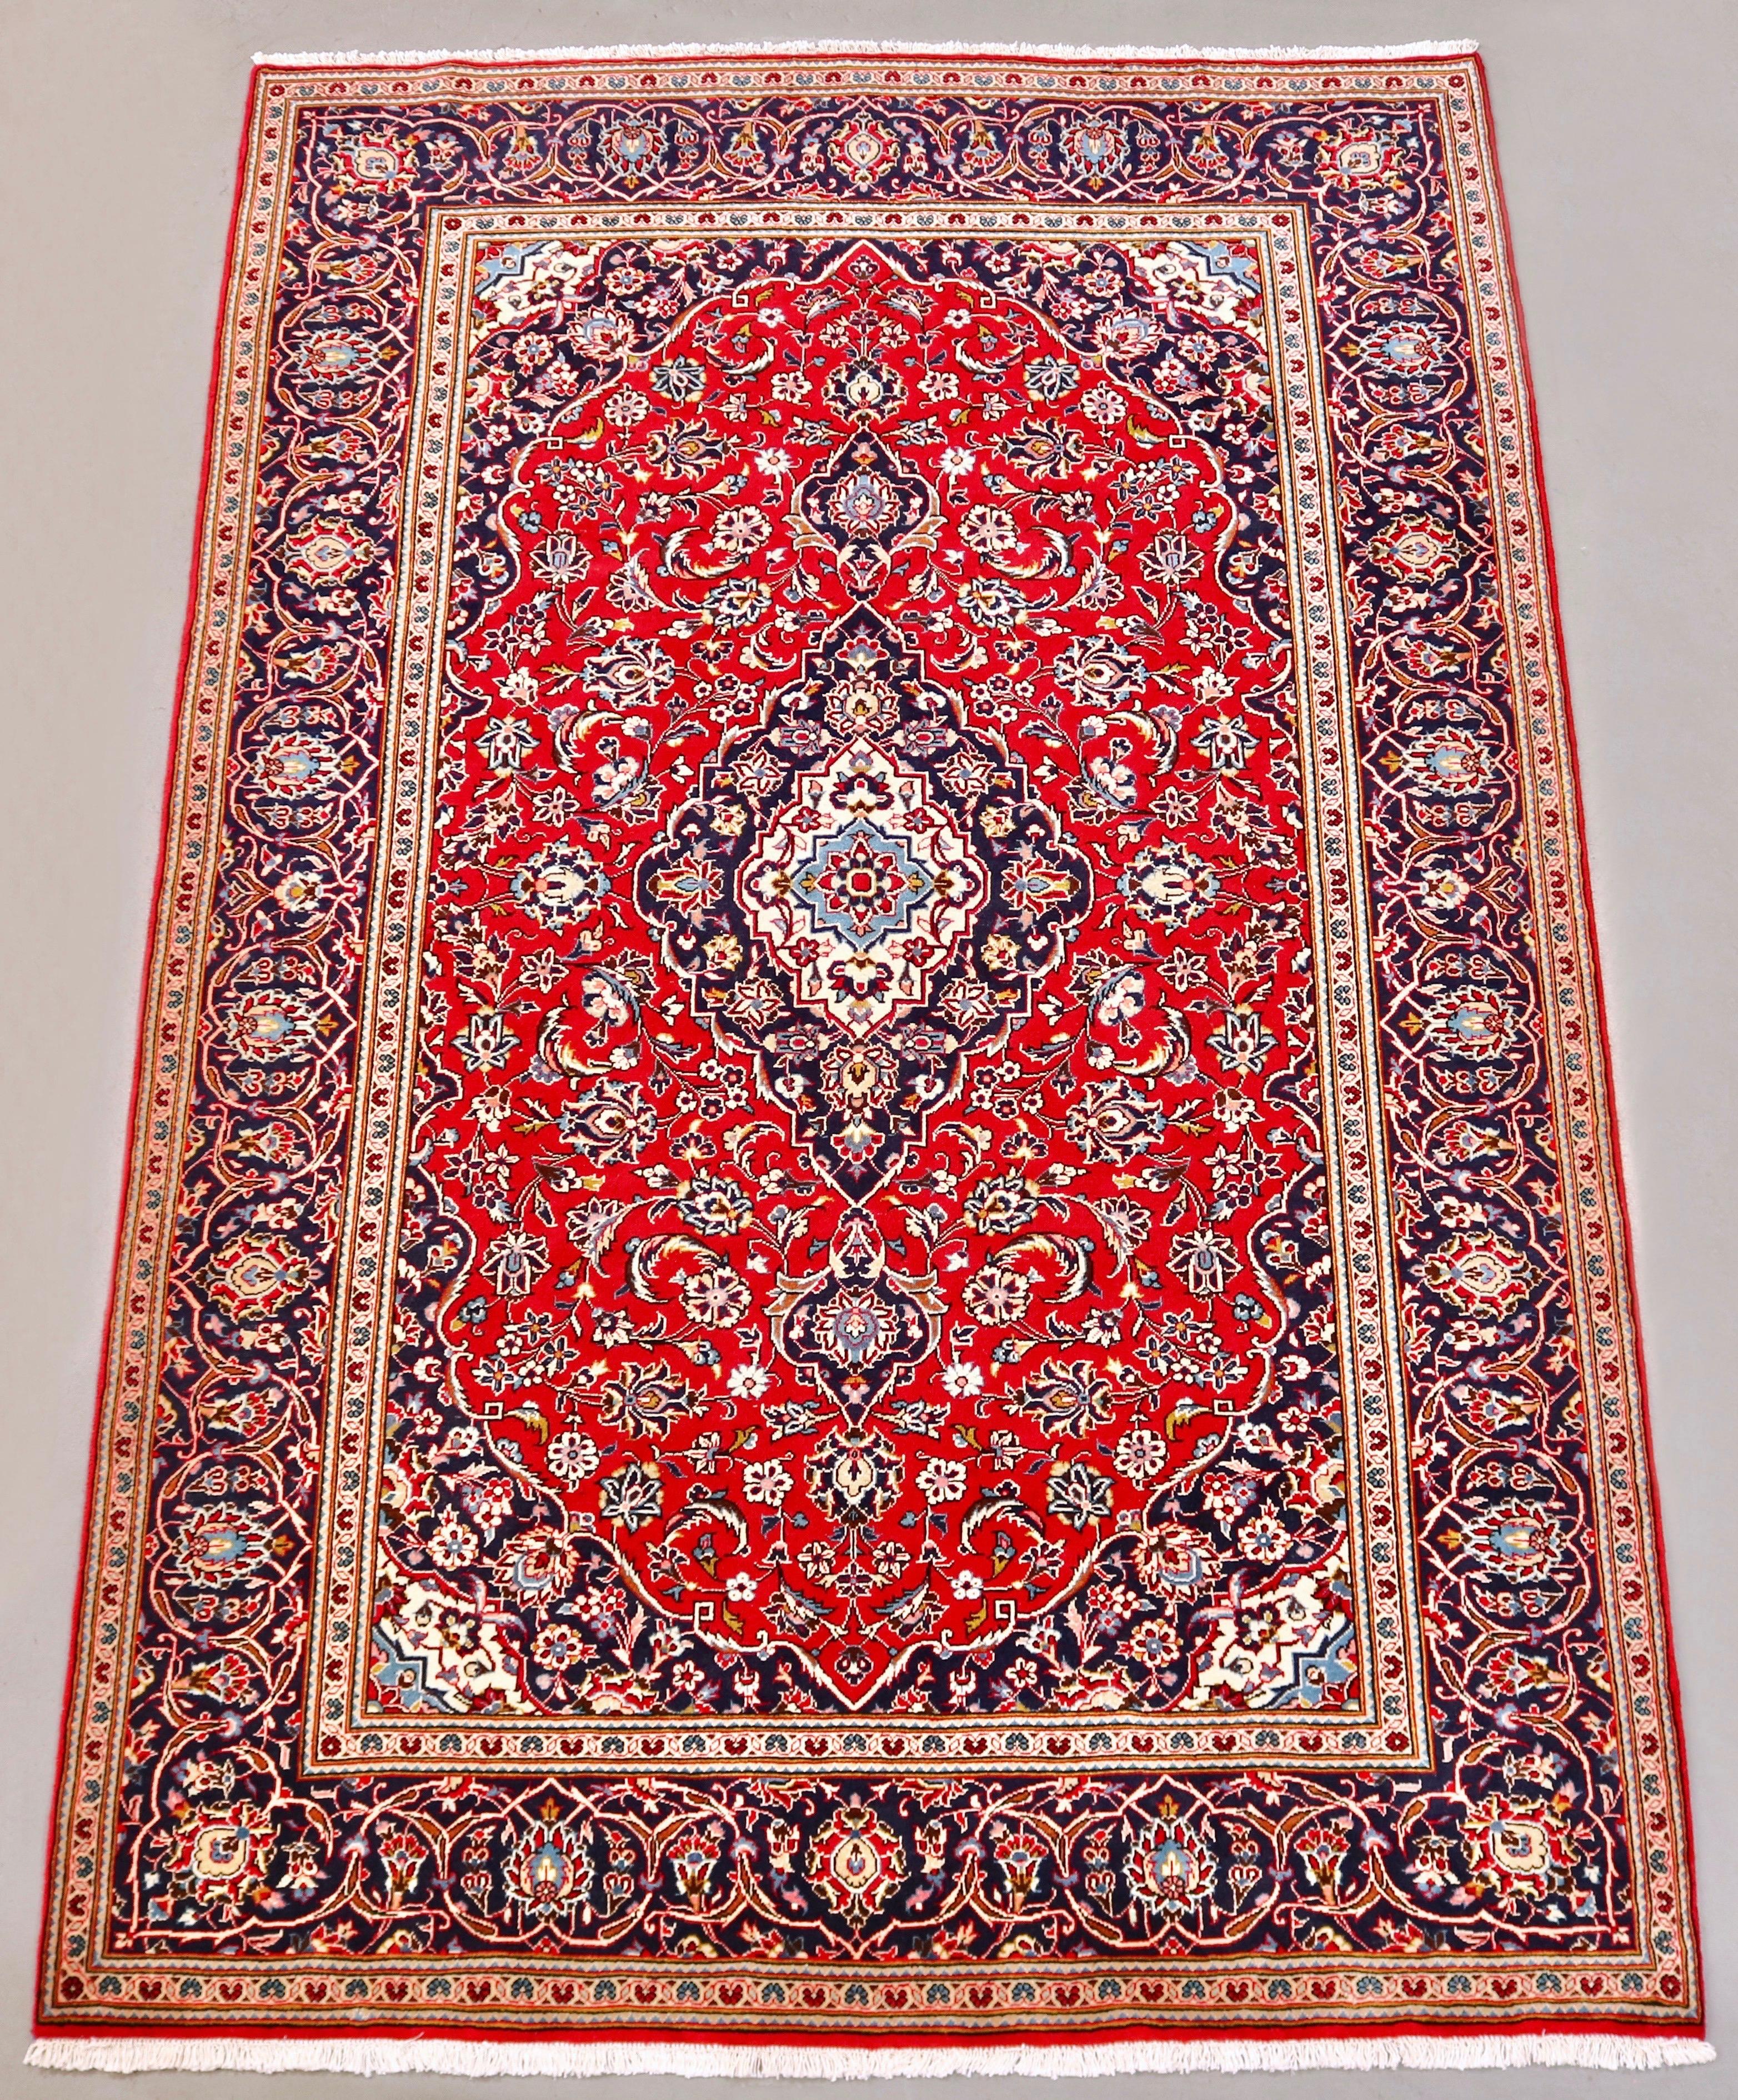 Kashan Persian Rug (Ref. 60) 300x195cm